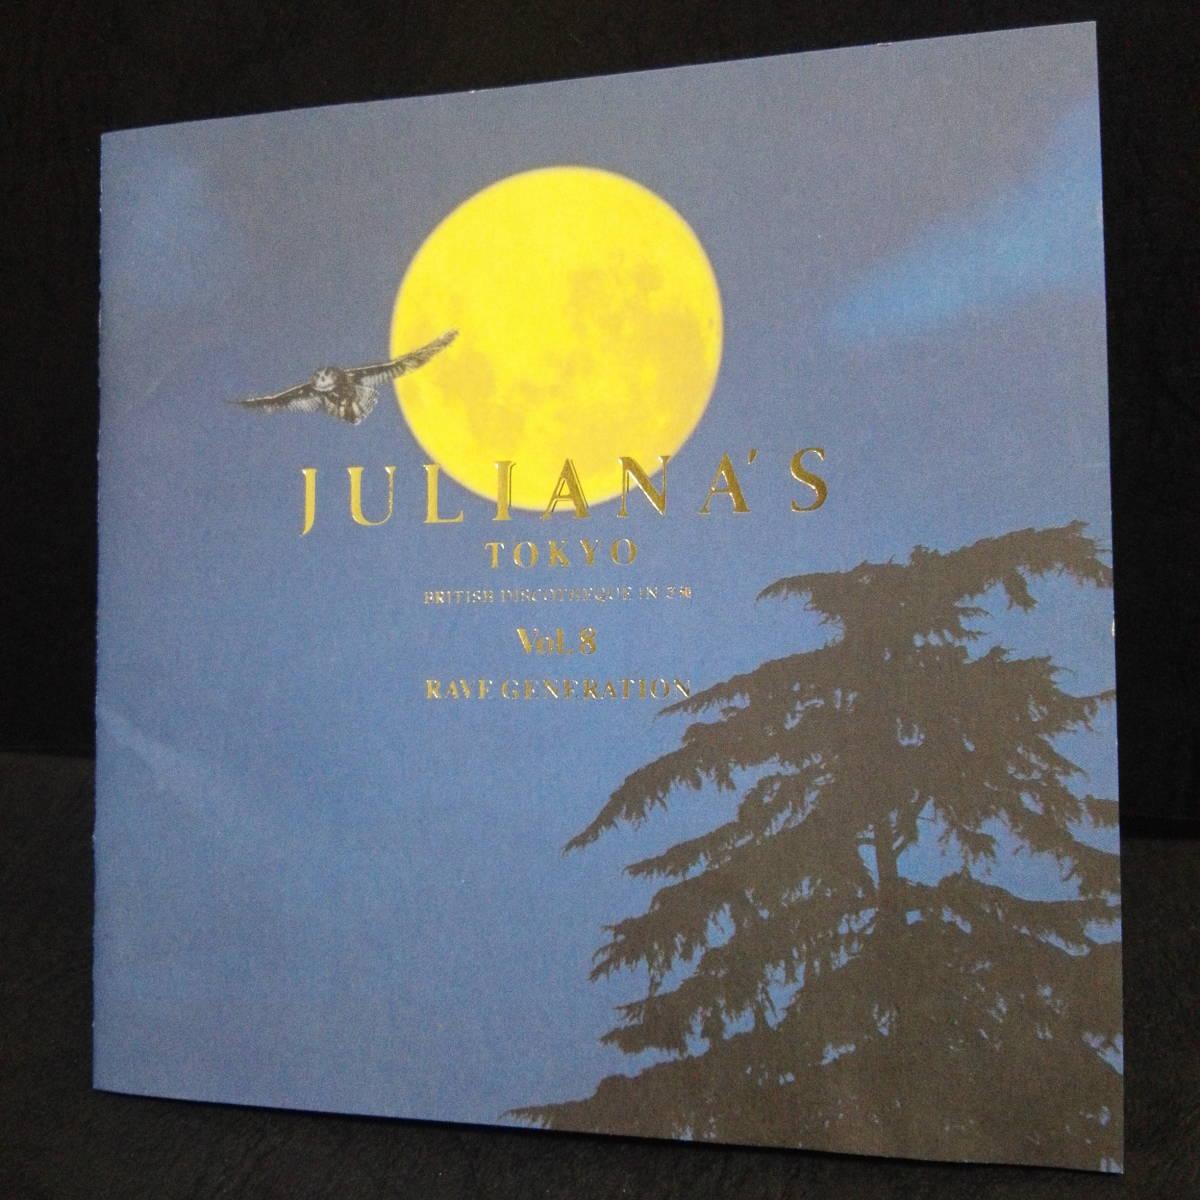 JULIANA'S TOKYO Vol.8 ジュリアナ 東京 90s ディスコ DISCO ジョンロビンソン John Robinson 2ND FUNK-TION L.A.STYLE RAVEMAN Fargetta_画像10